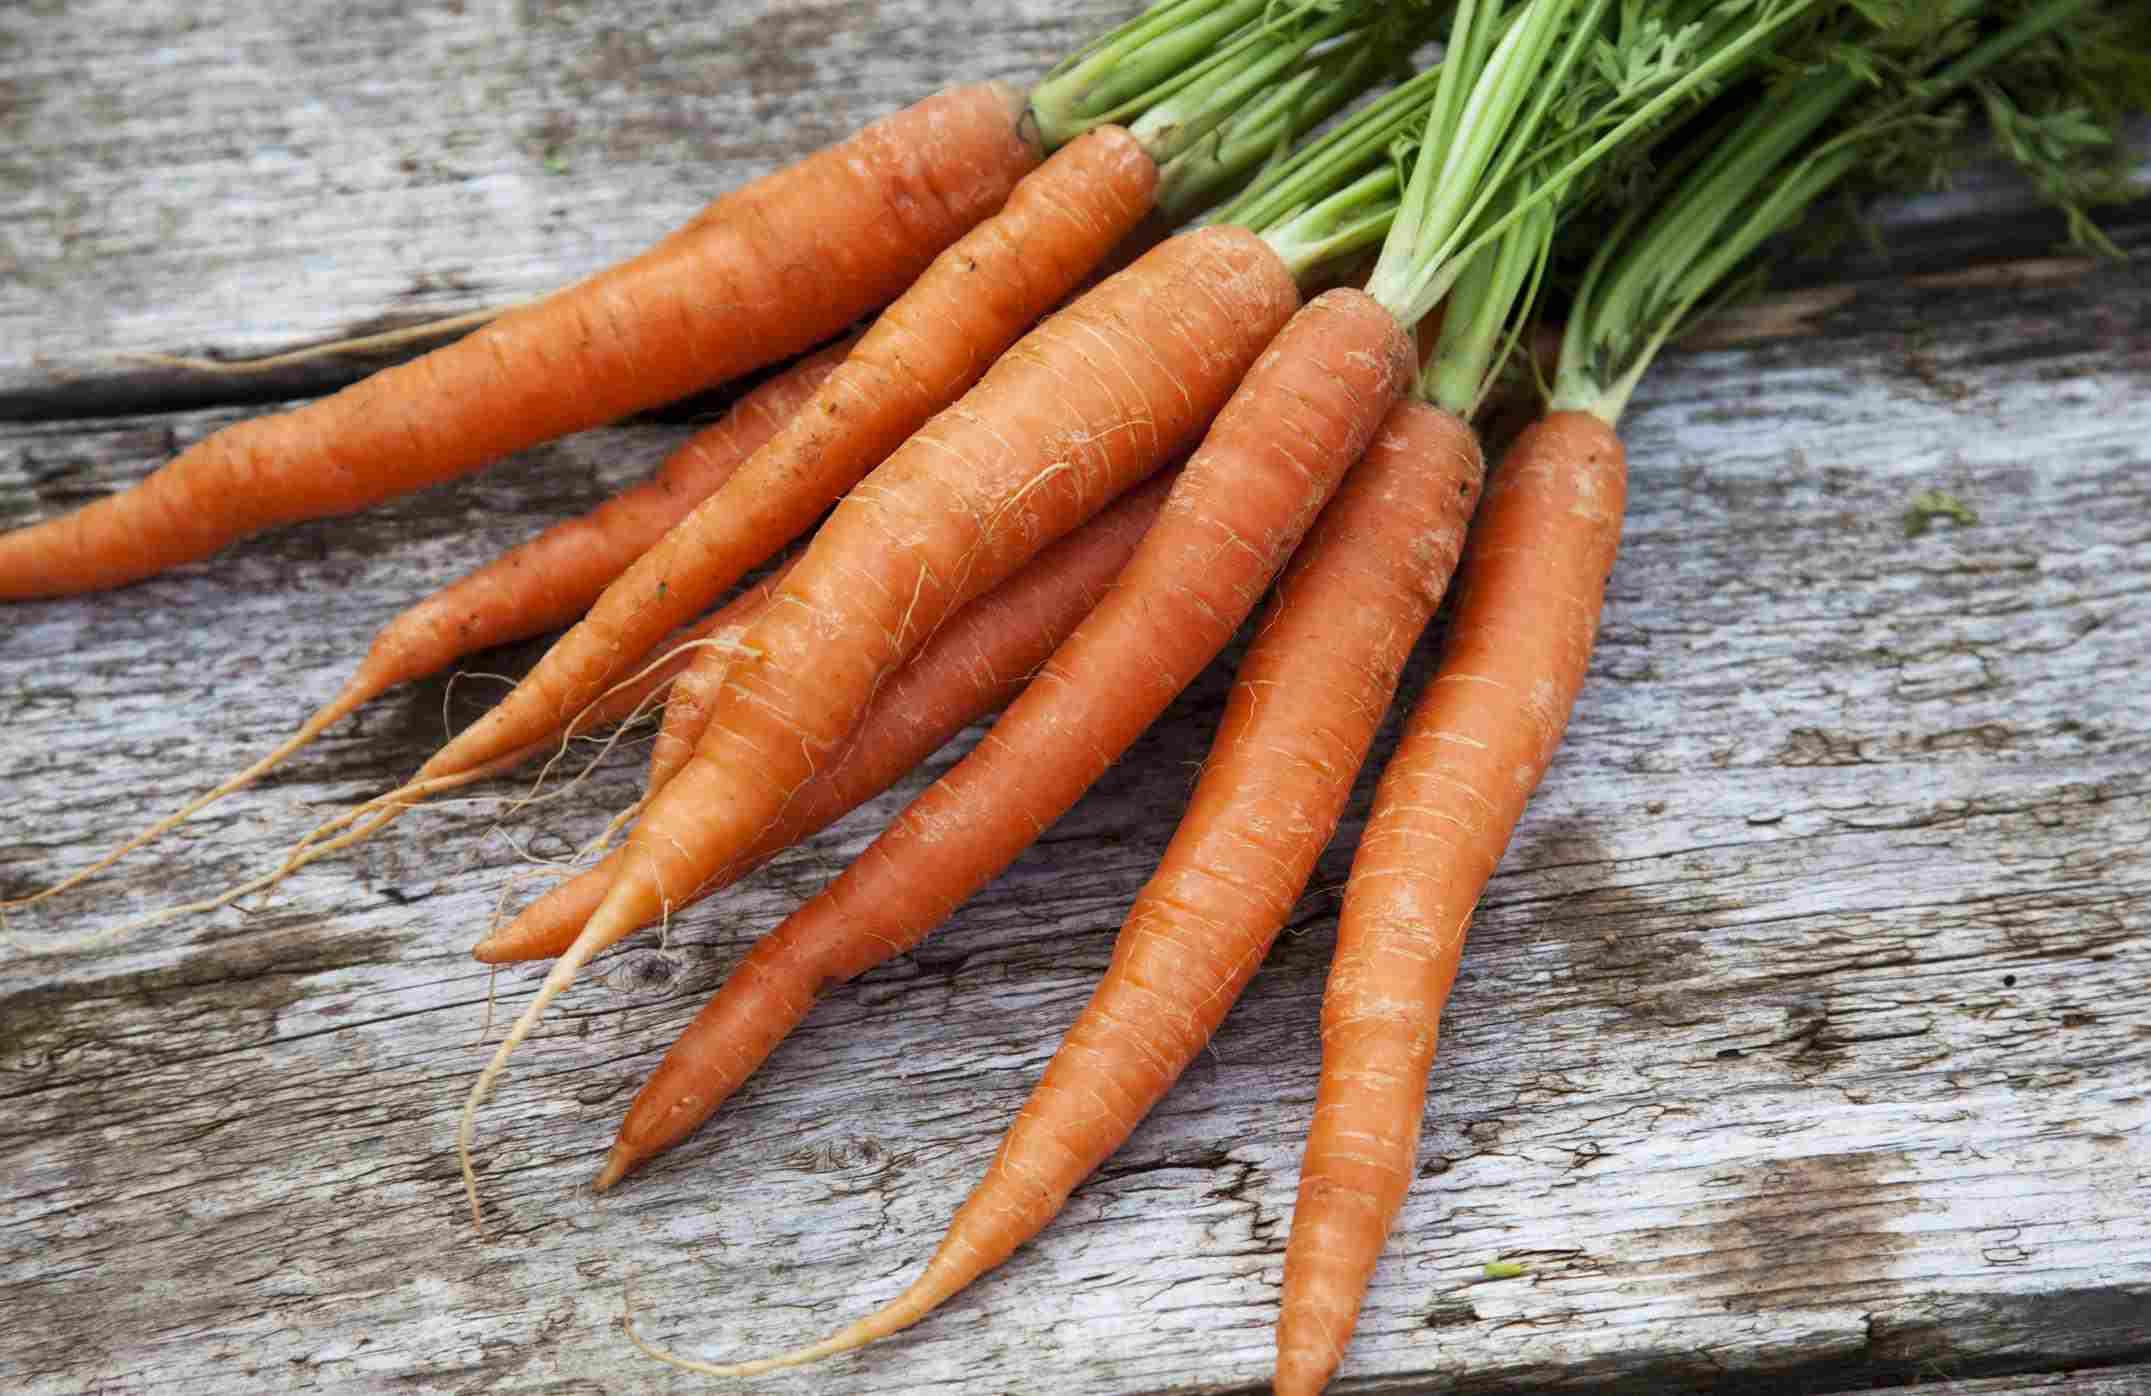 A bundle of fresh carrots